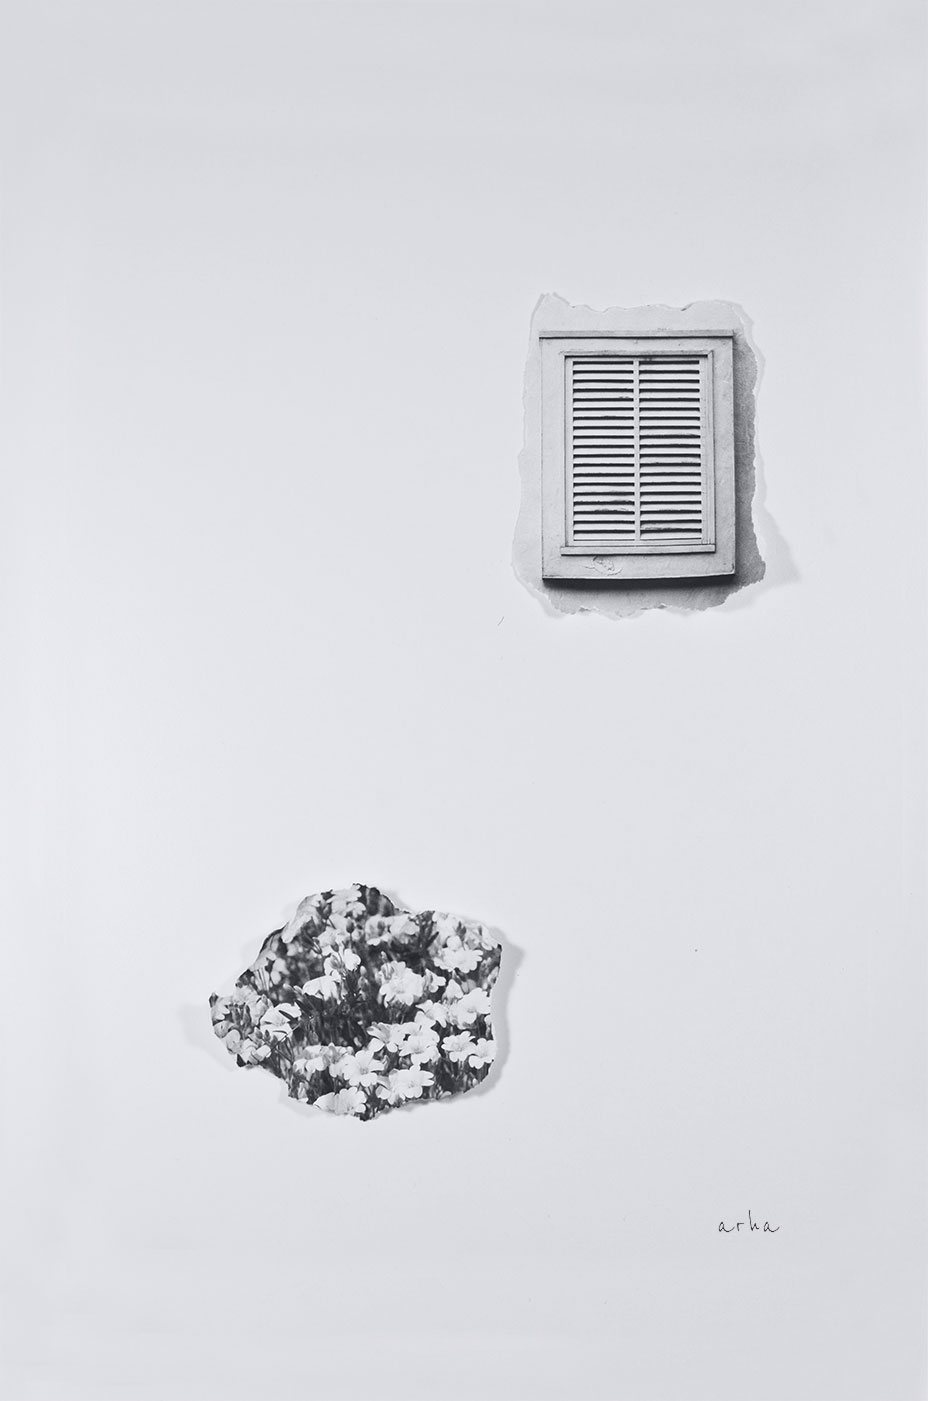 Window-and-flower-minimalism-copyright-2013-arha-Tomomichi-Morifuji